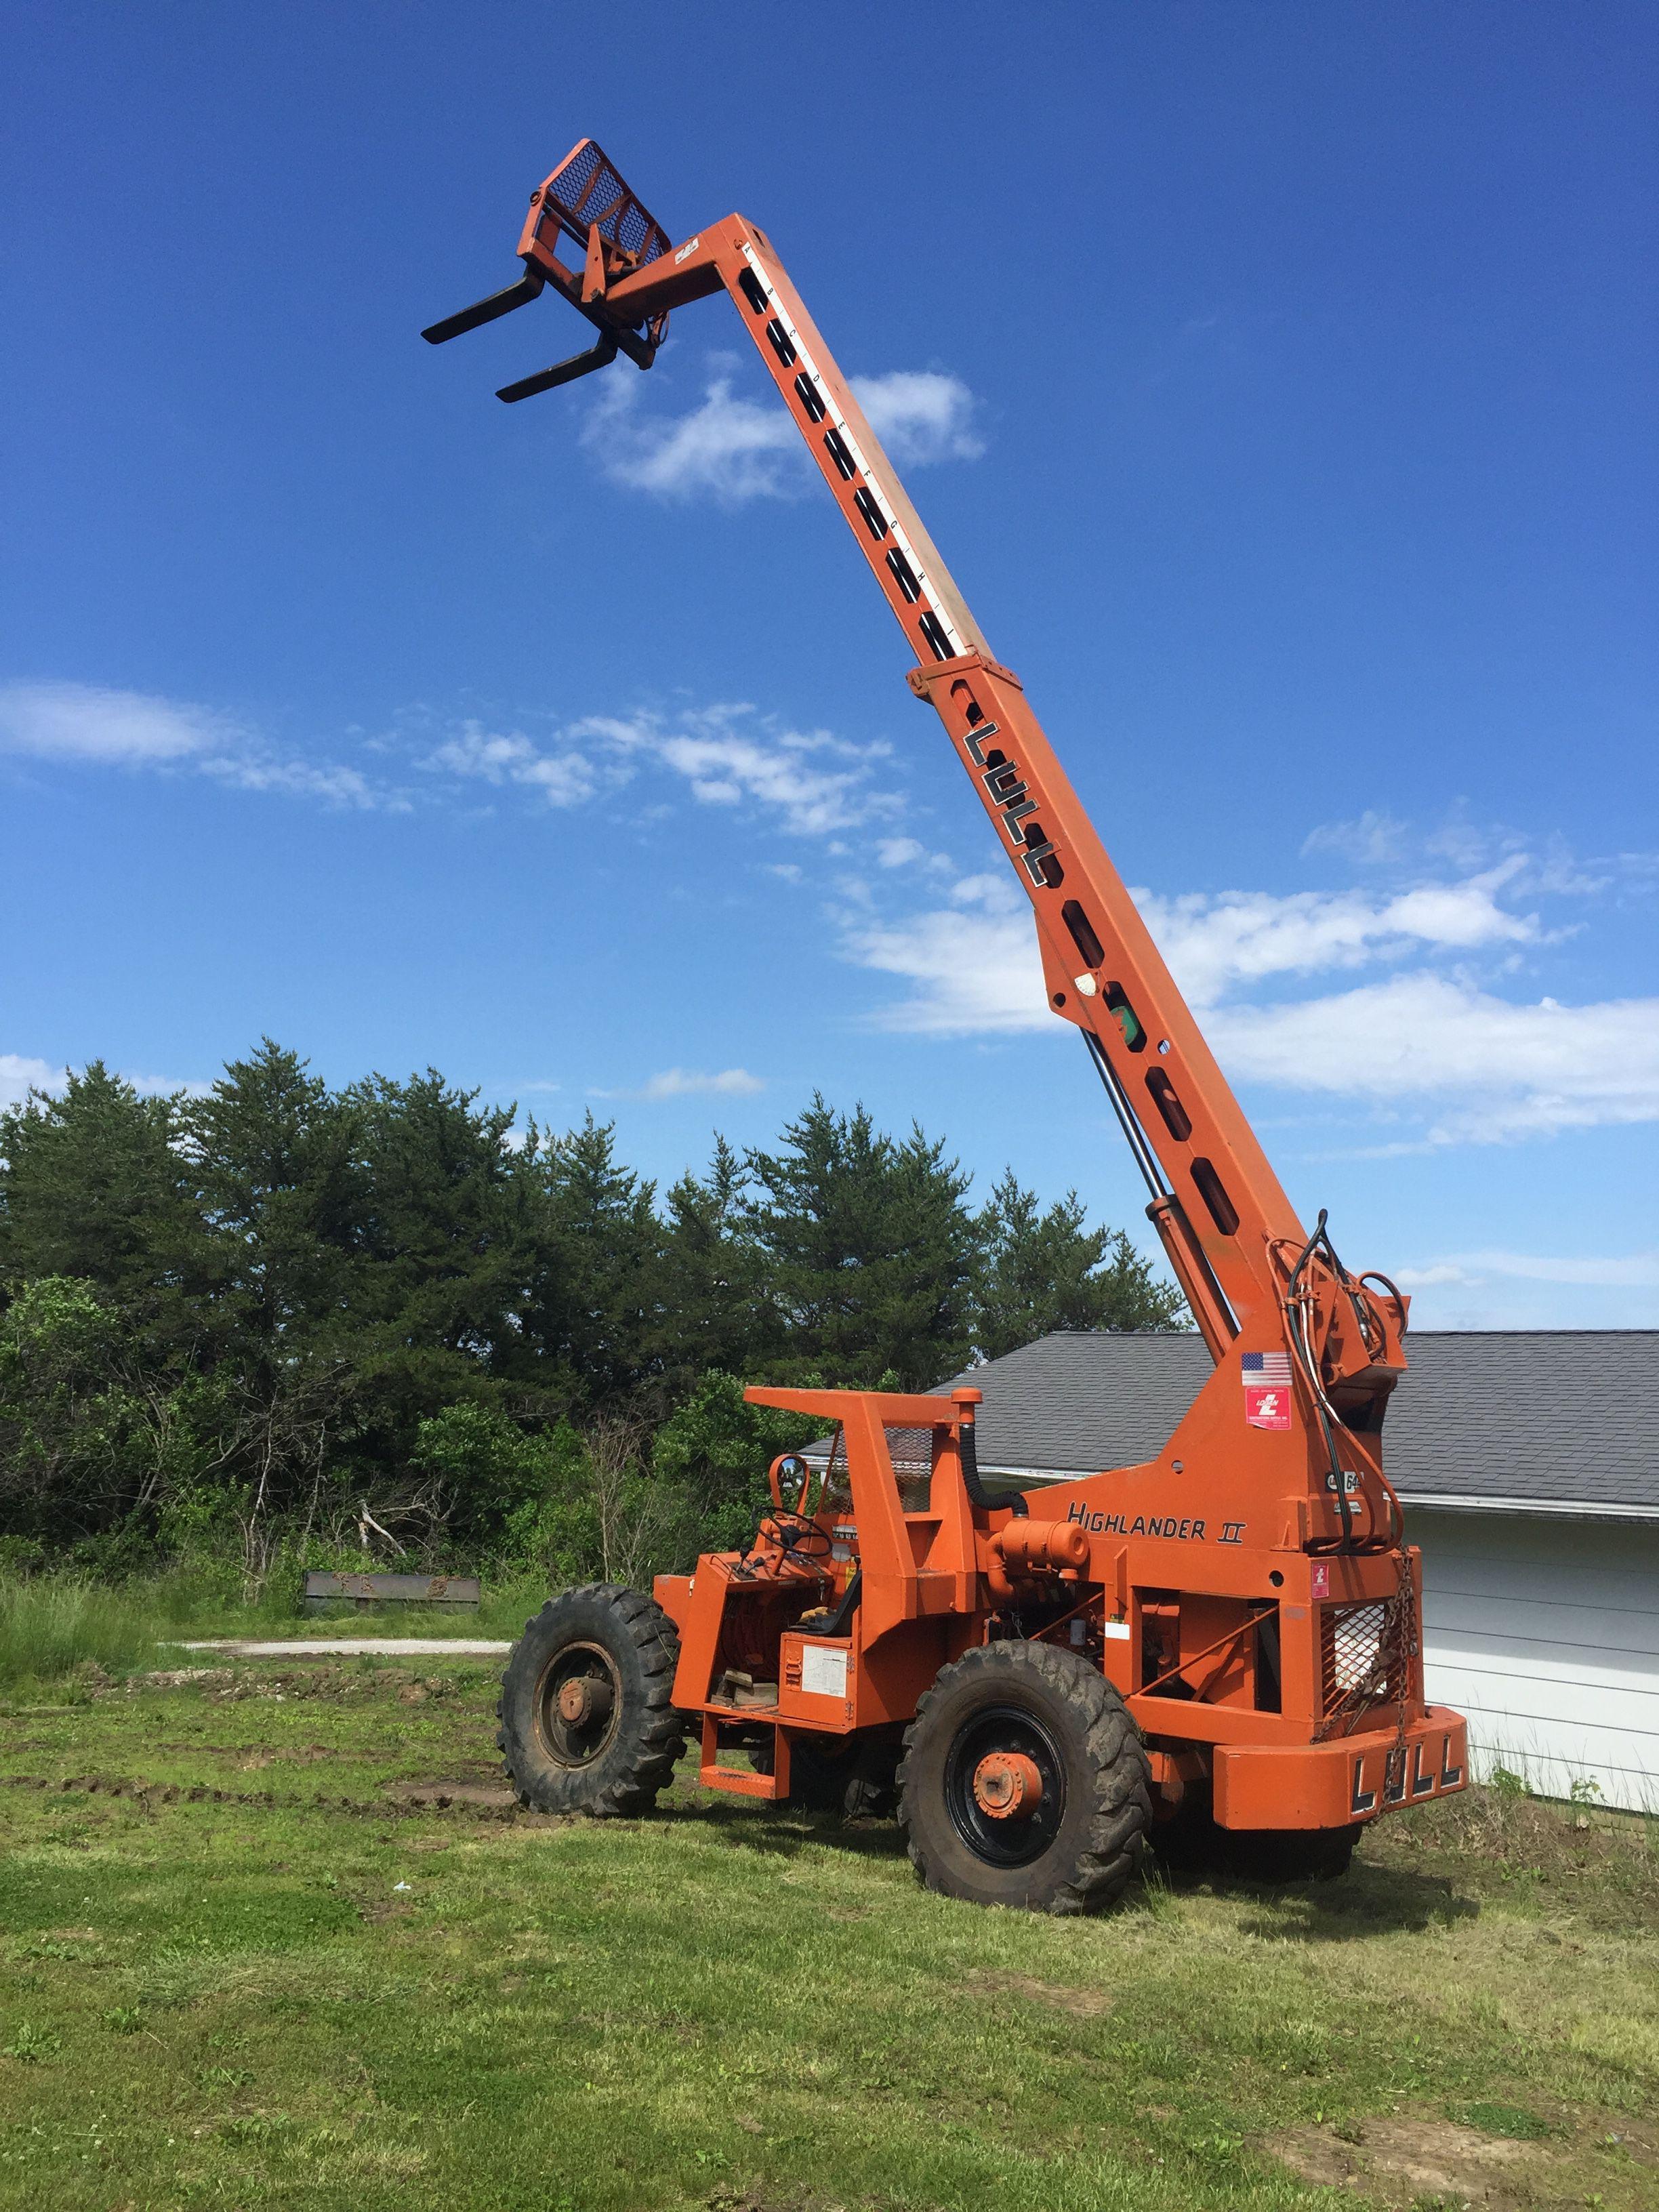 High reach forklift image 1